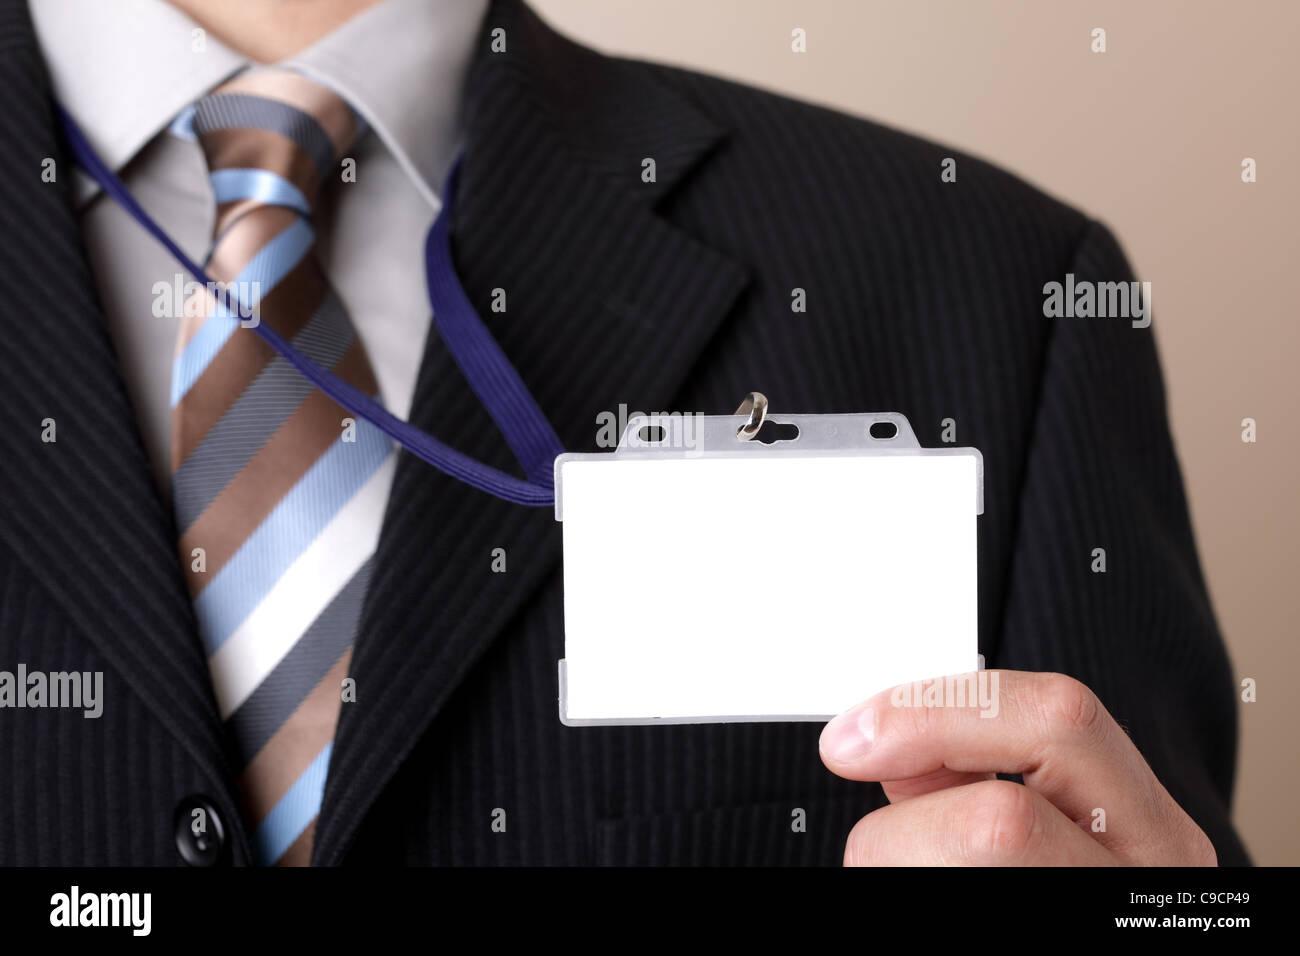 Businessman holding blank ID badge - Stock Image